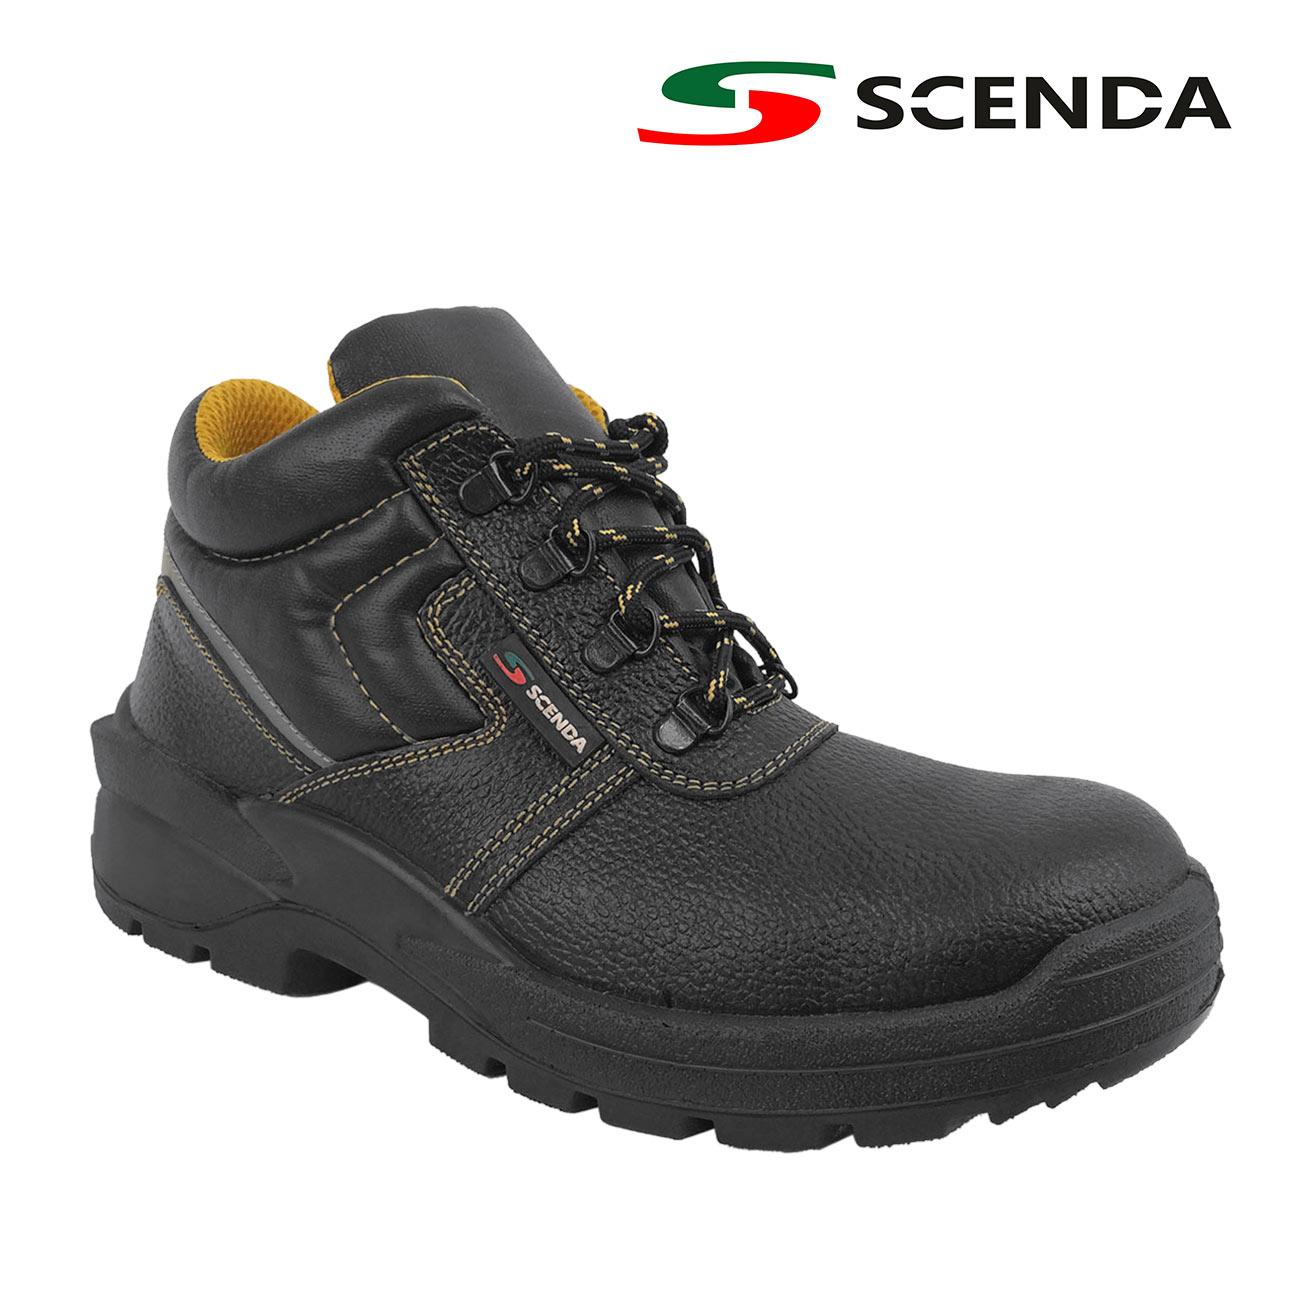 Ботинки кожаные PROFI Basic 5841 S1 - артикул: 926100242